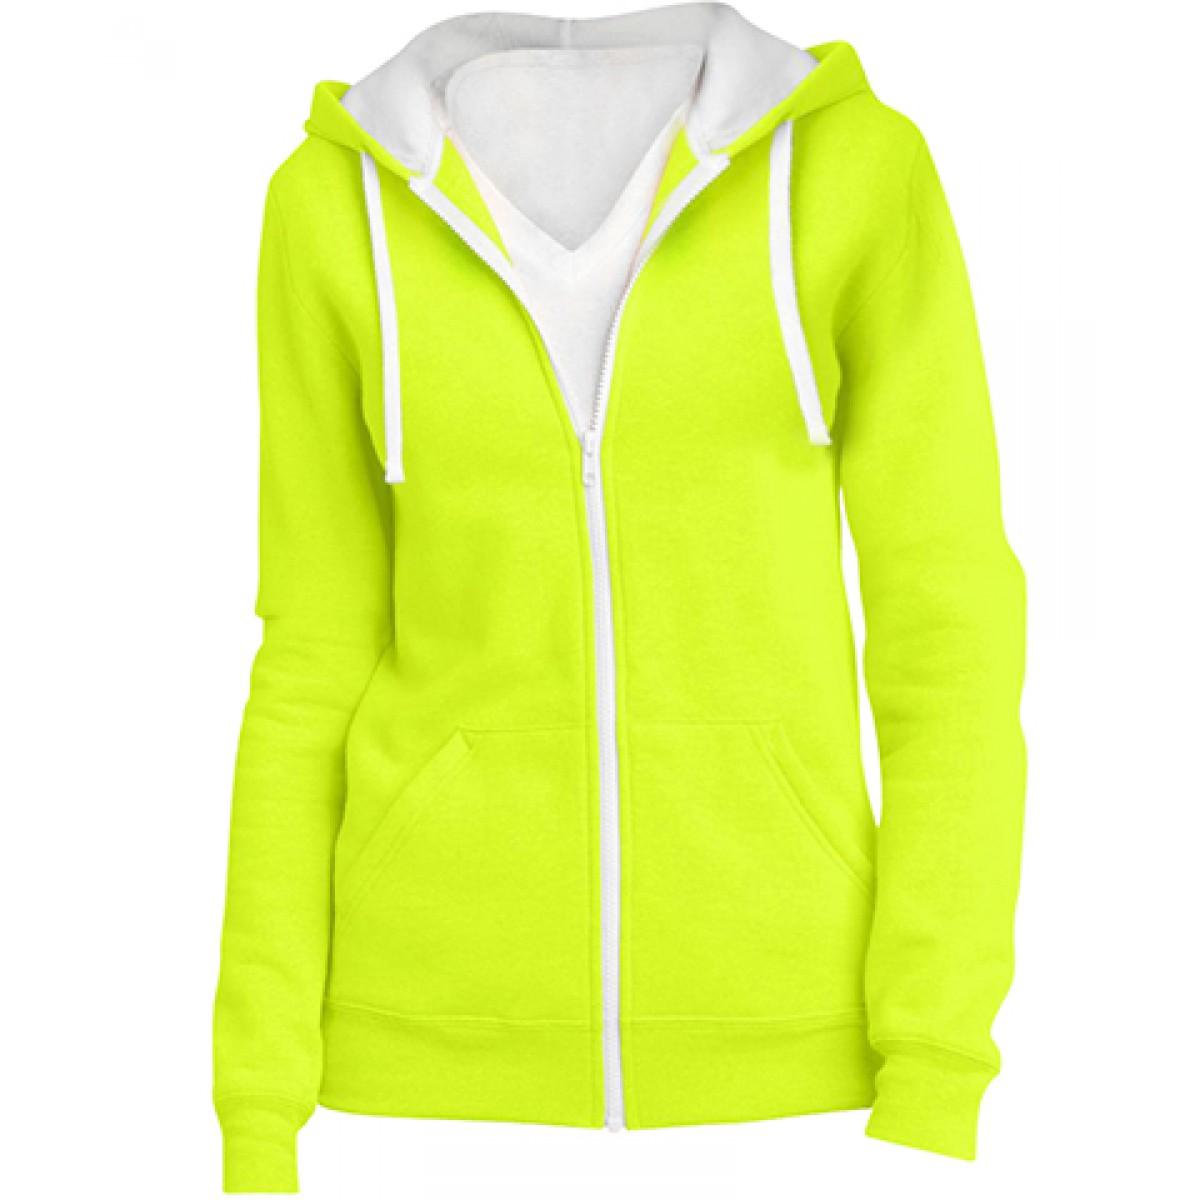 Juniors Full-Zip Hoodie-Safety Green-4XL